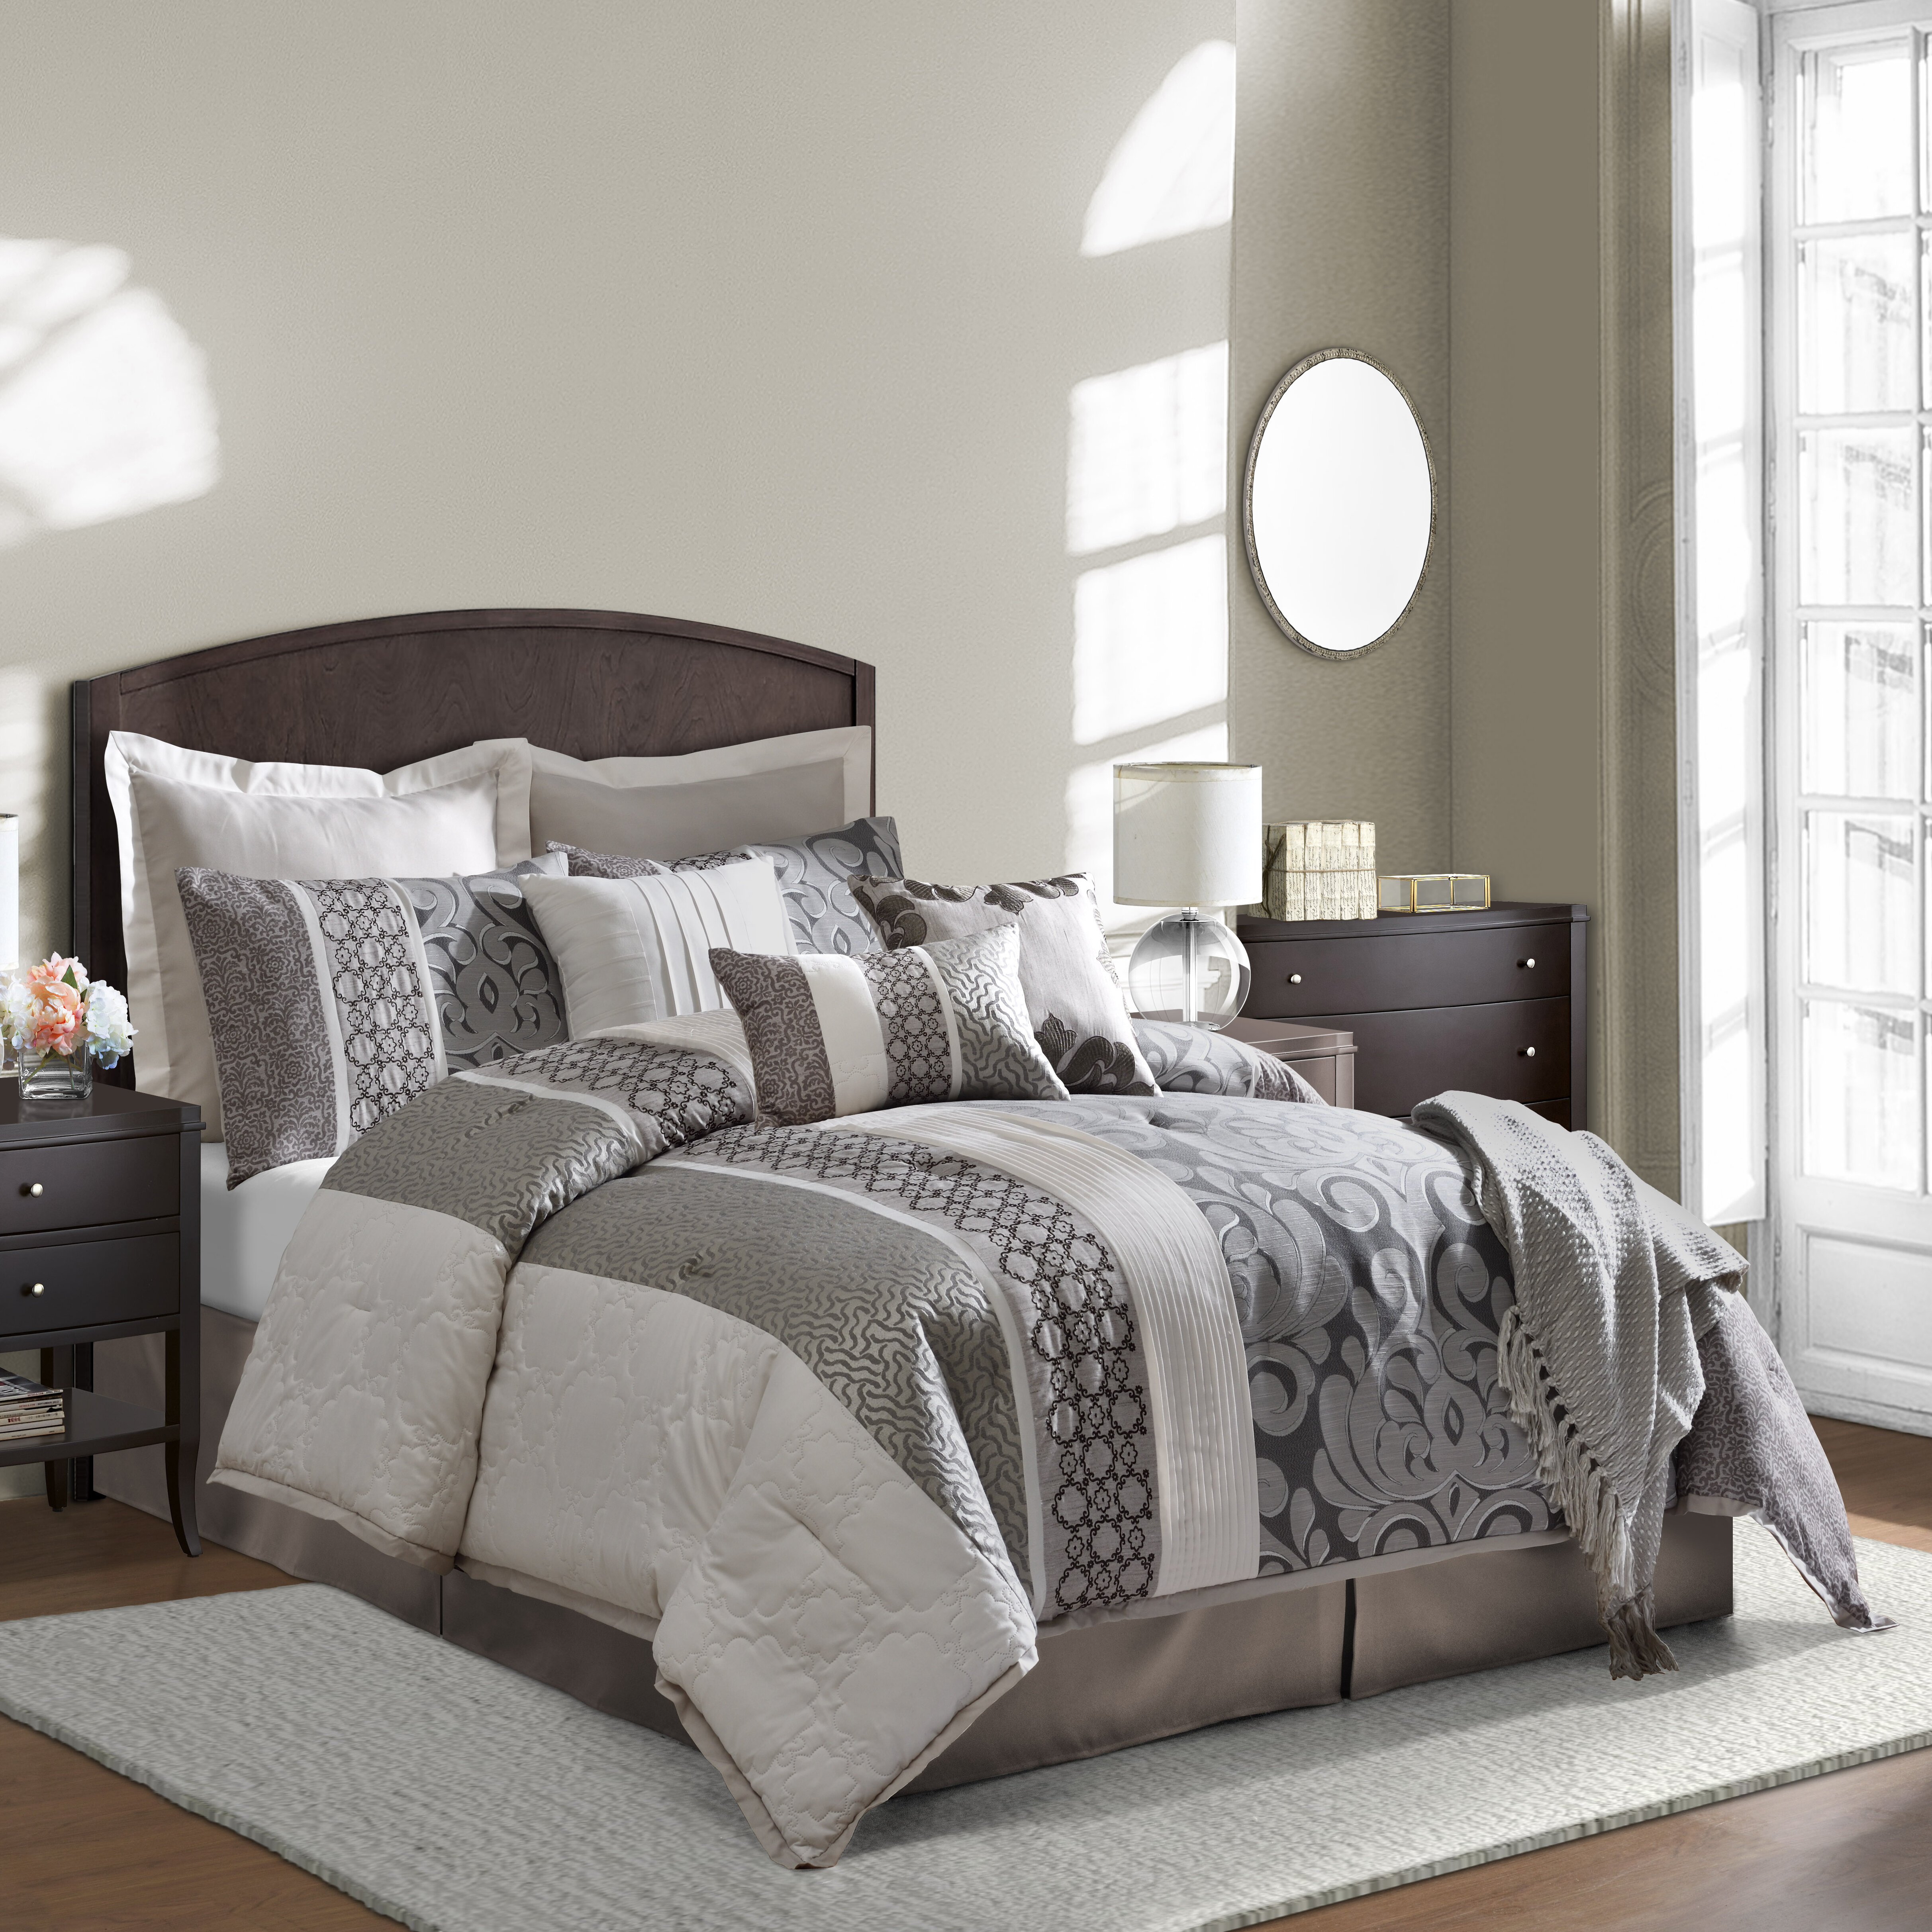 product retreat src p collection tide bedding dwp desktop southern a zoom layer comforter comp belk tropical